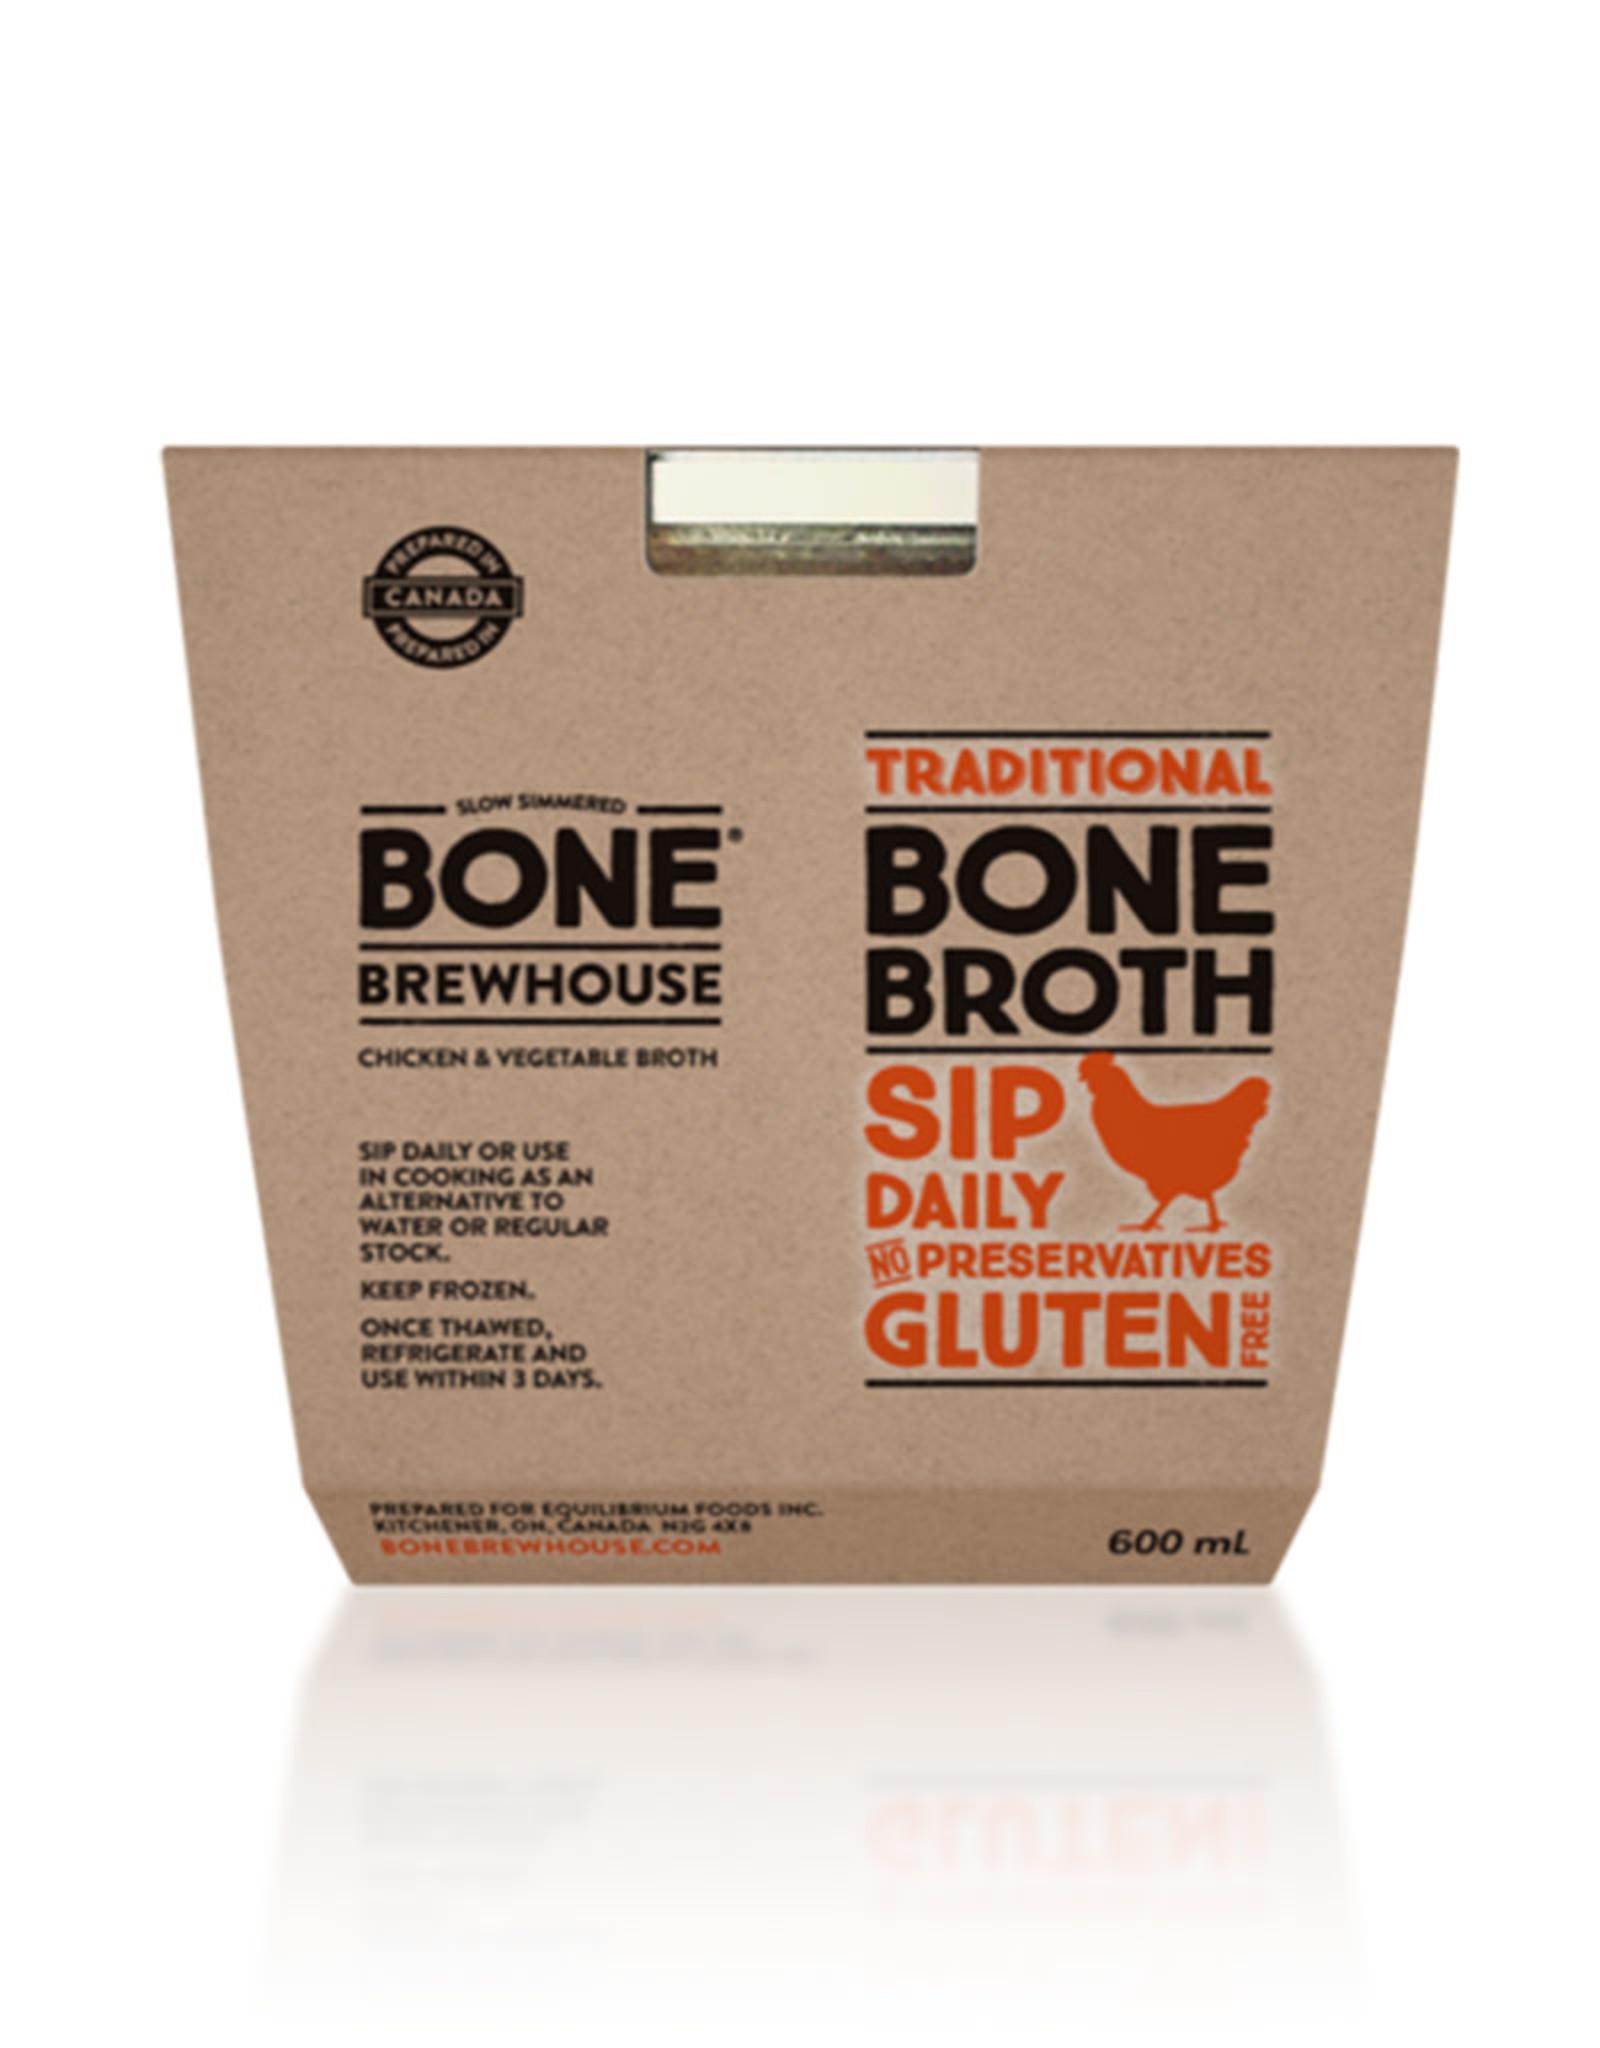 Bone Brewhouse Bone Brewhouse - Bone Broth, Chicken & Vegetable